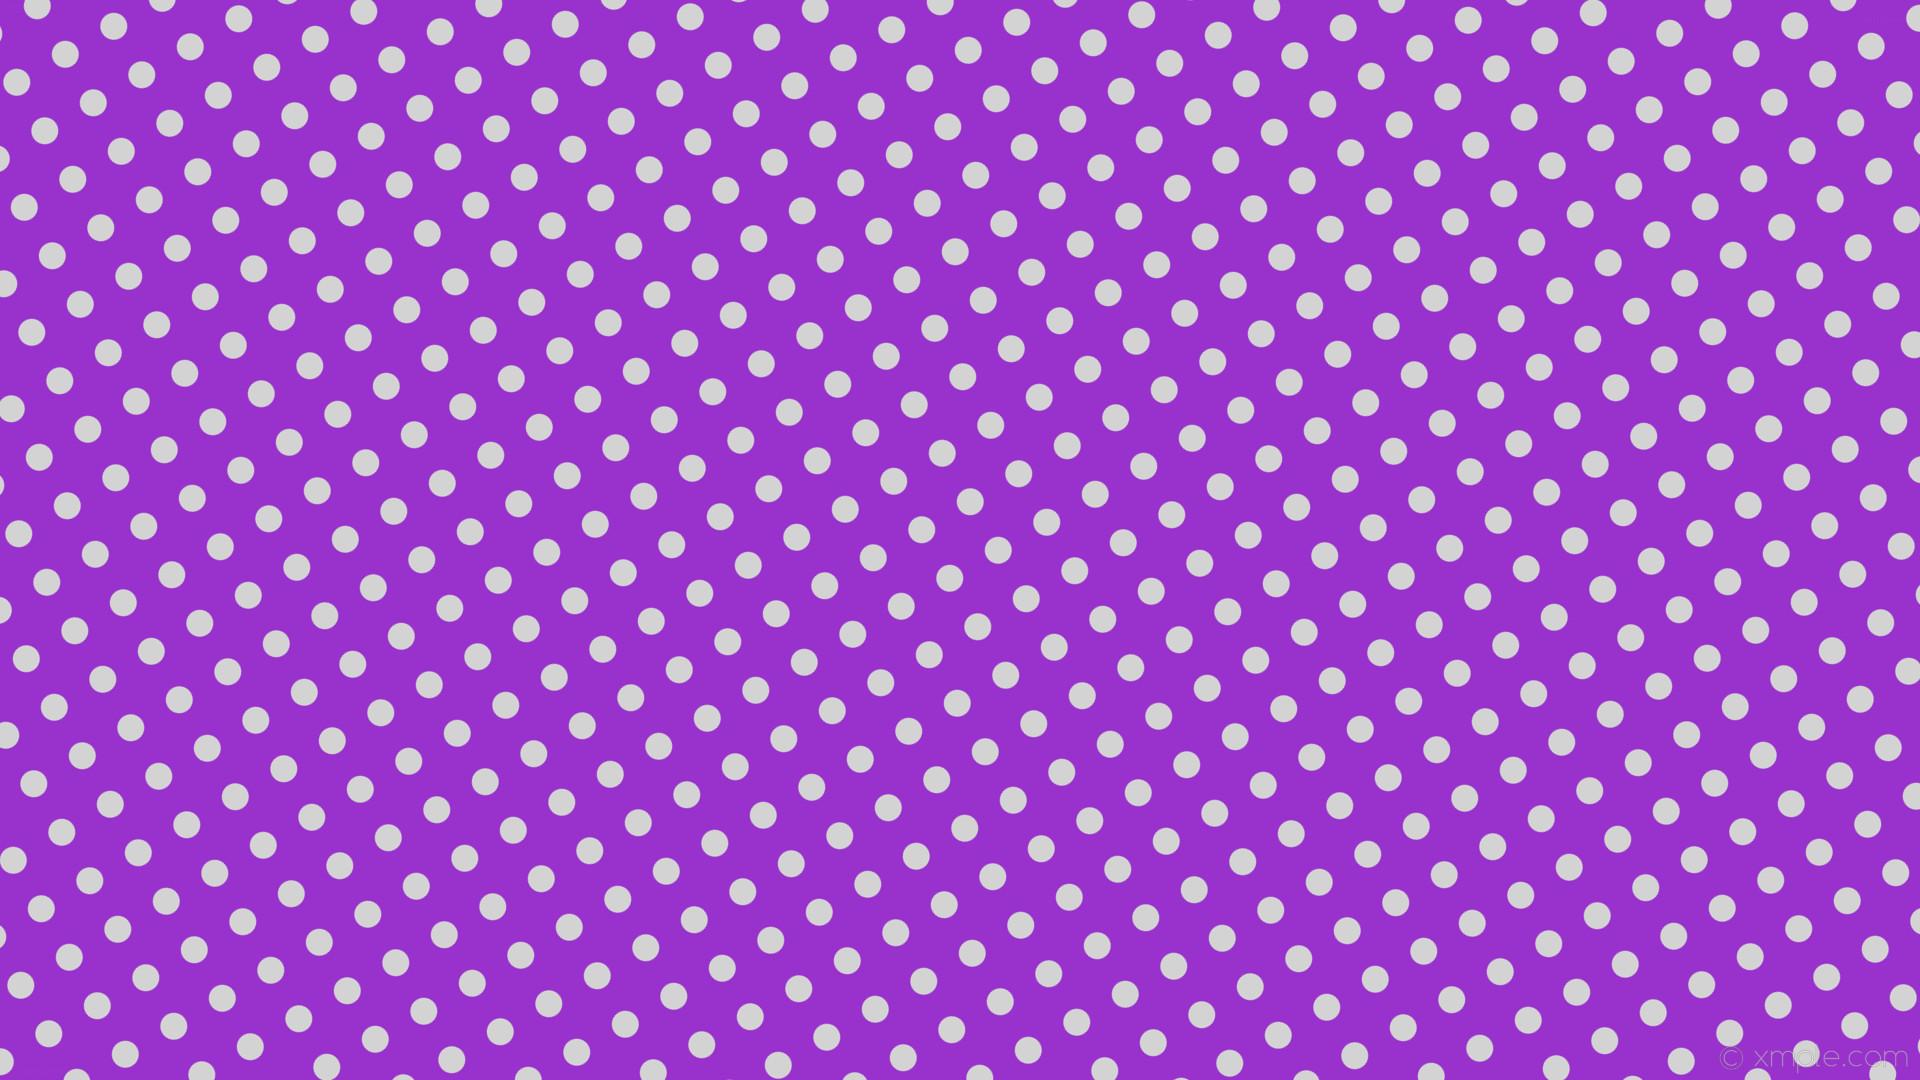 Purple and grey wallpaper 73 images 1920x1080 wallpaper purple 3d cubes grey white dark magenta gray 8b008b 808080 ffffff 45 voltagebd Image collections